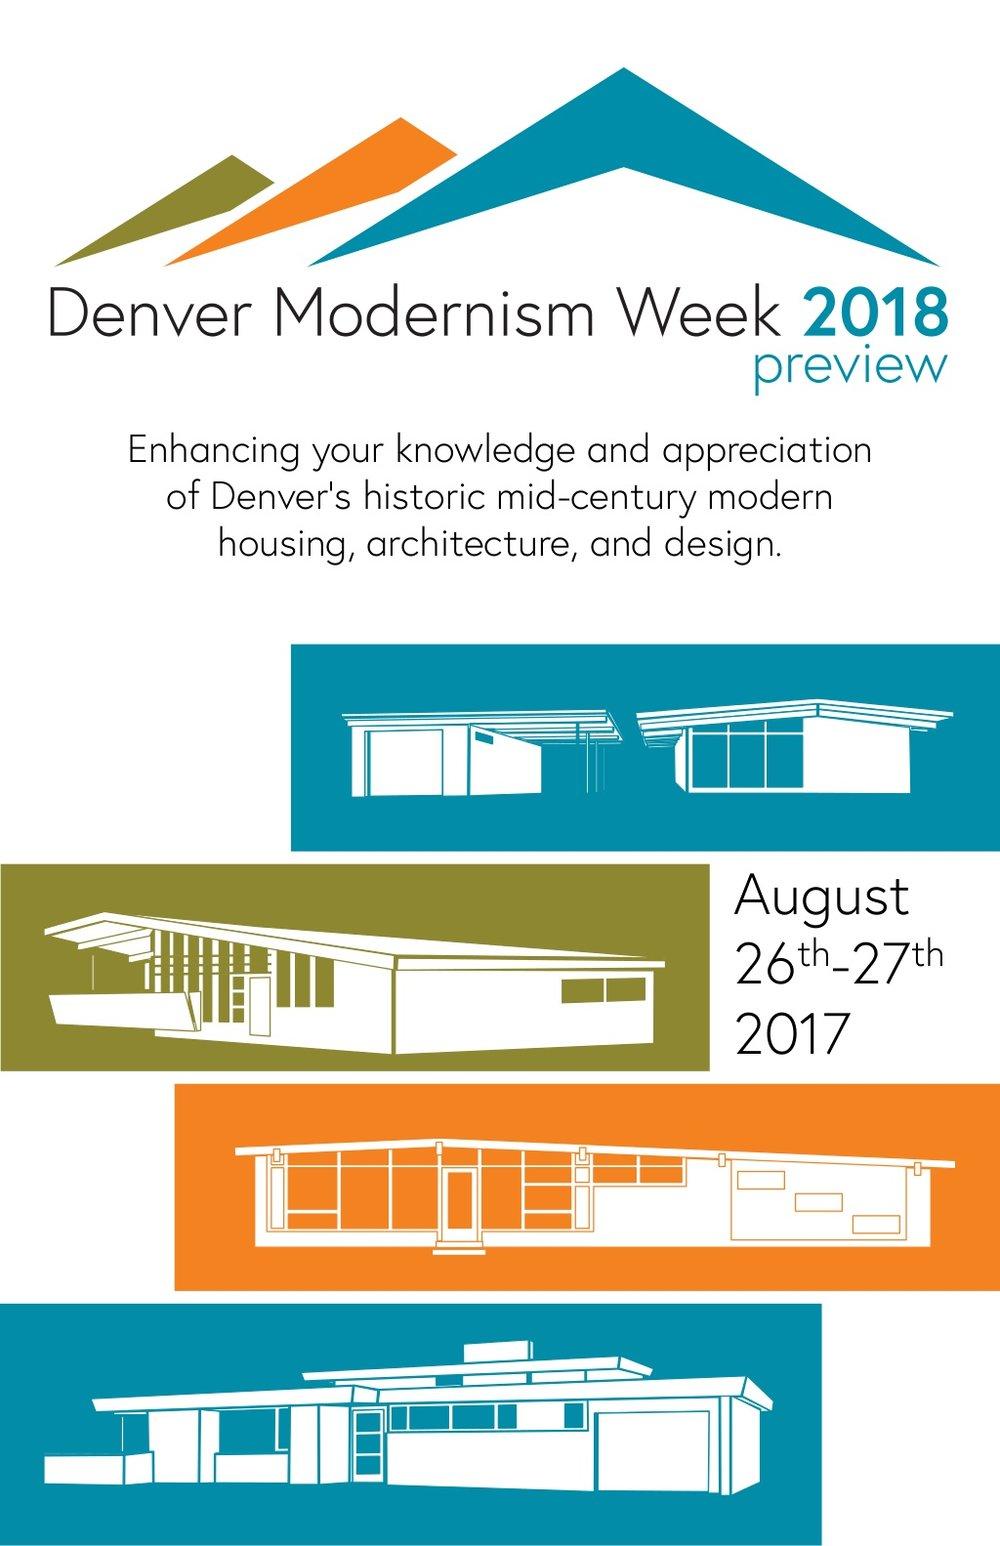 denver-modernism-week-2018-preview-1-1024.jpg